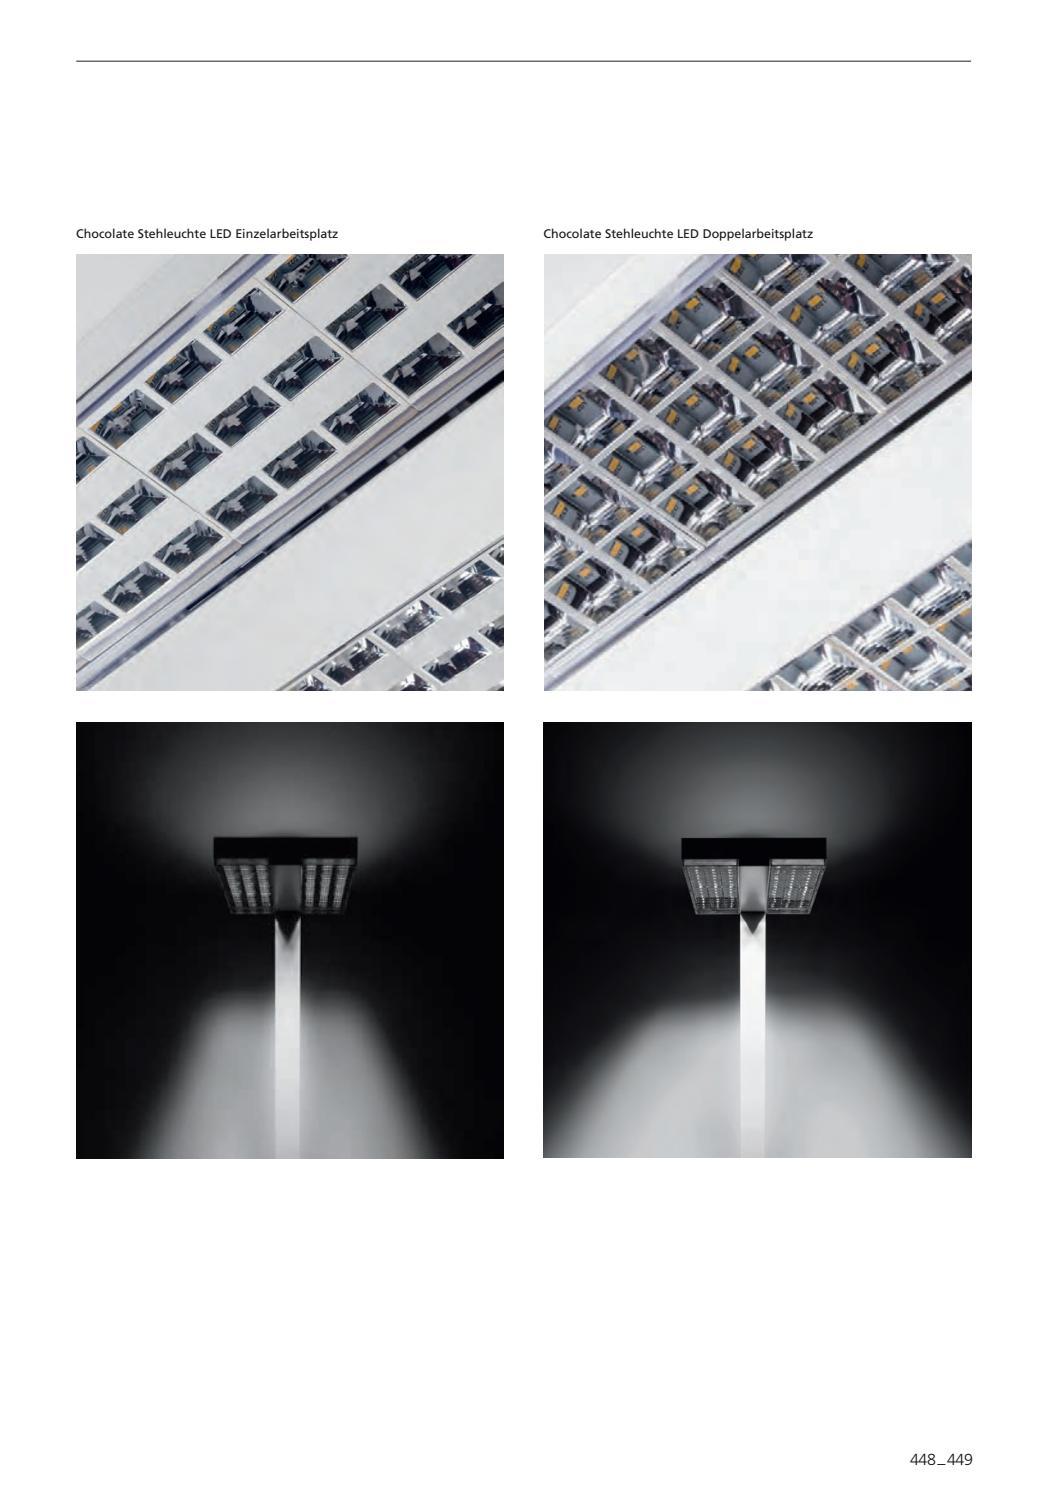 10 x 5mm 9 Volt LED Verkabelt Weiss LEDs WEIß 9V DC